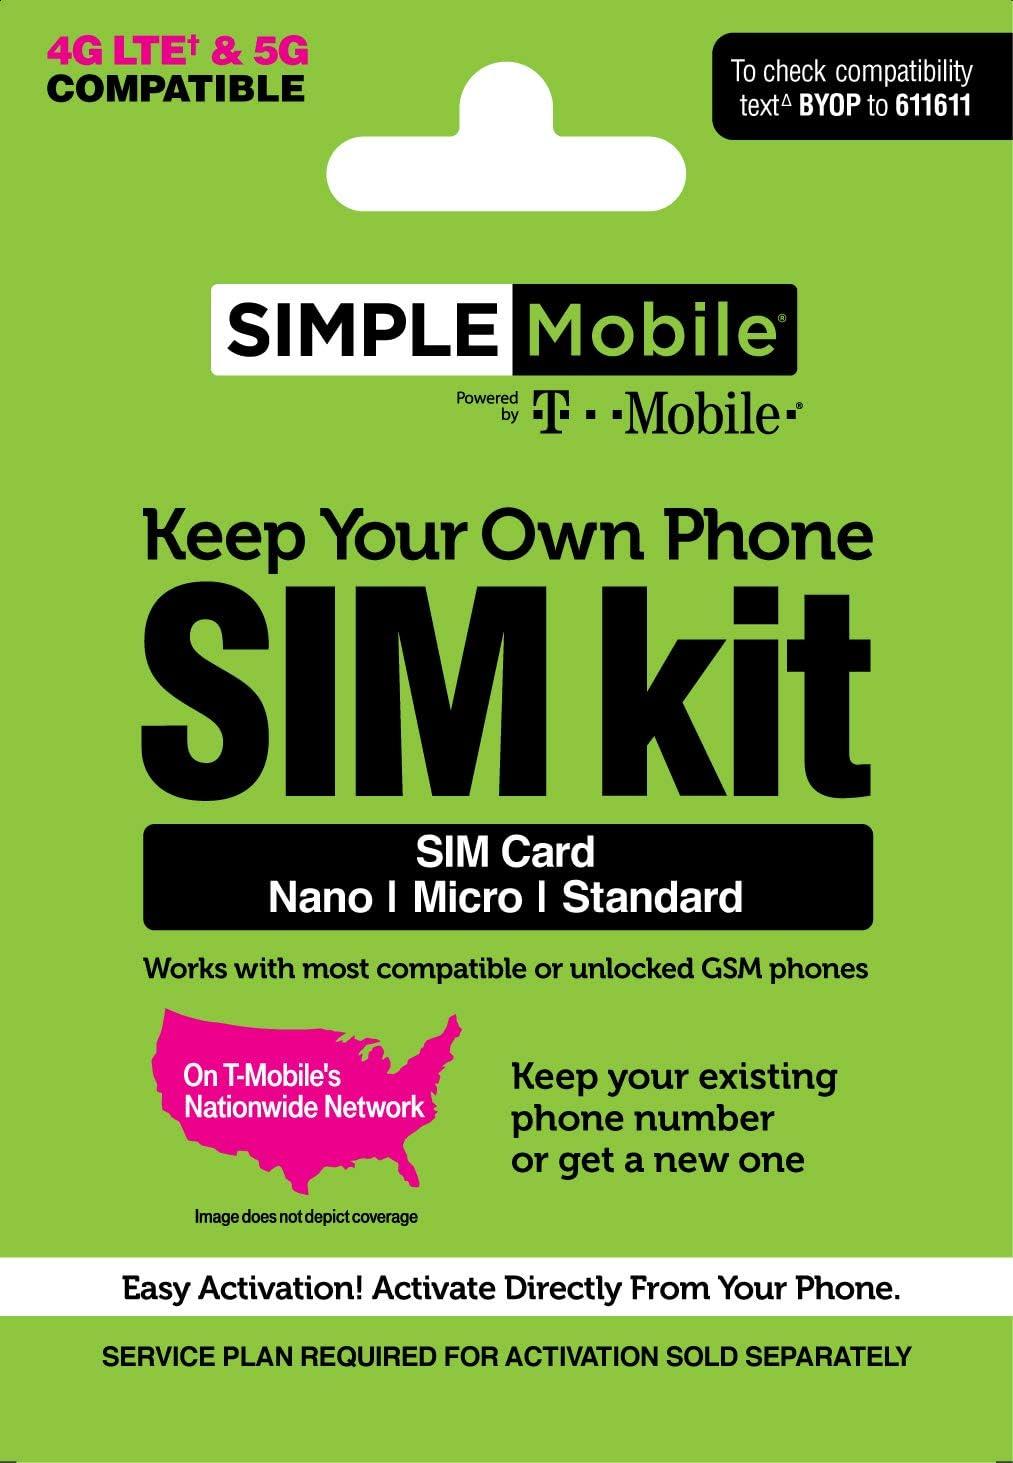 Simple Mobile Keep Your Own Phone 3-in-1 Prepaid SIM Kit